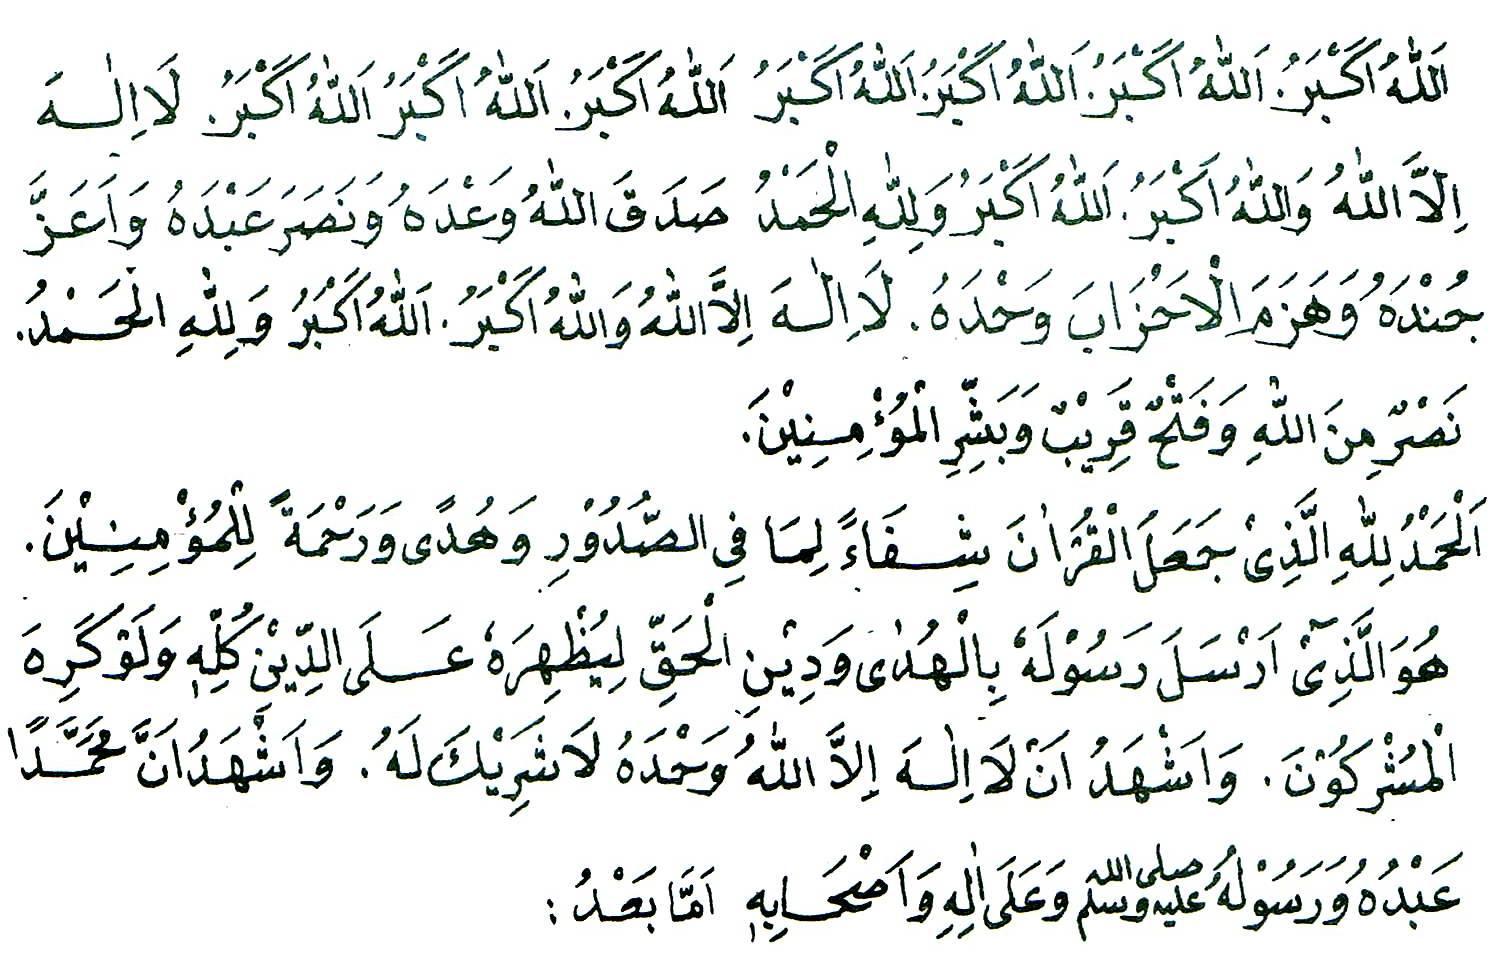 Sholat Idul Adha Dilaksanakan Pada Tanggal - Betrumz